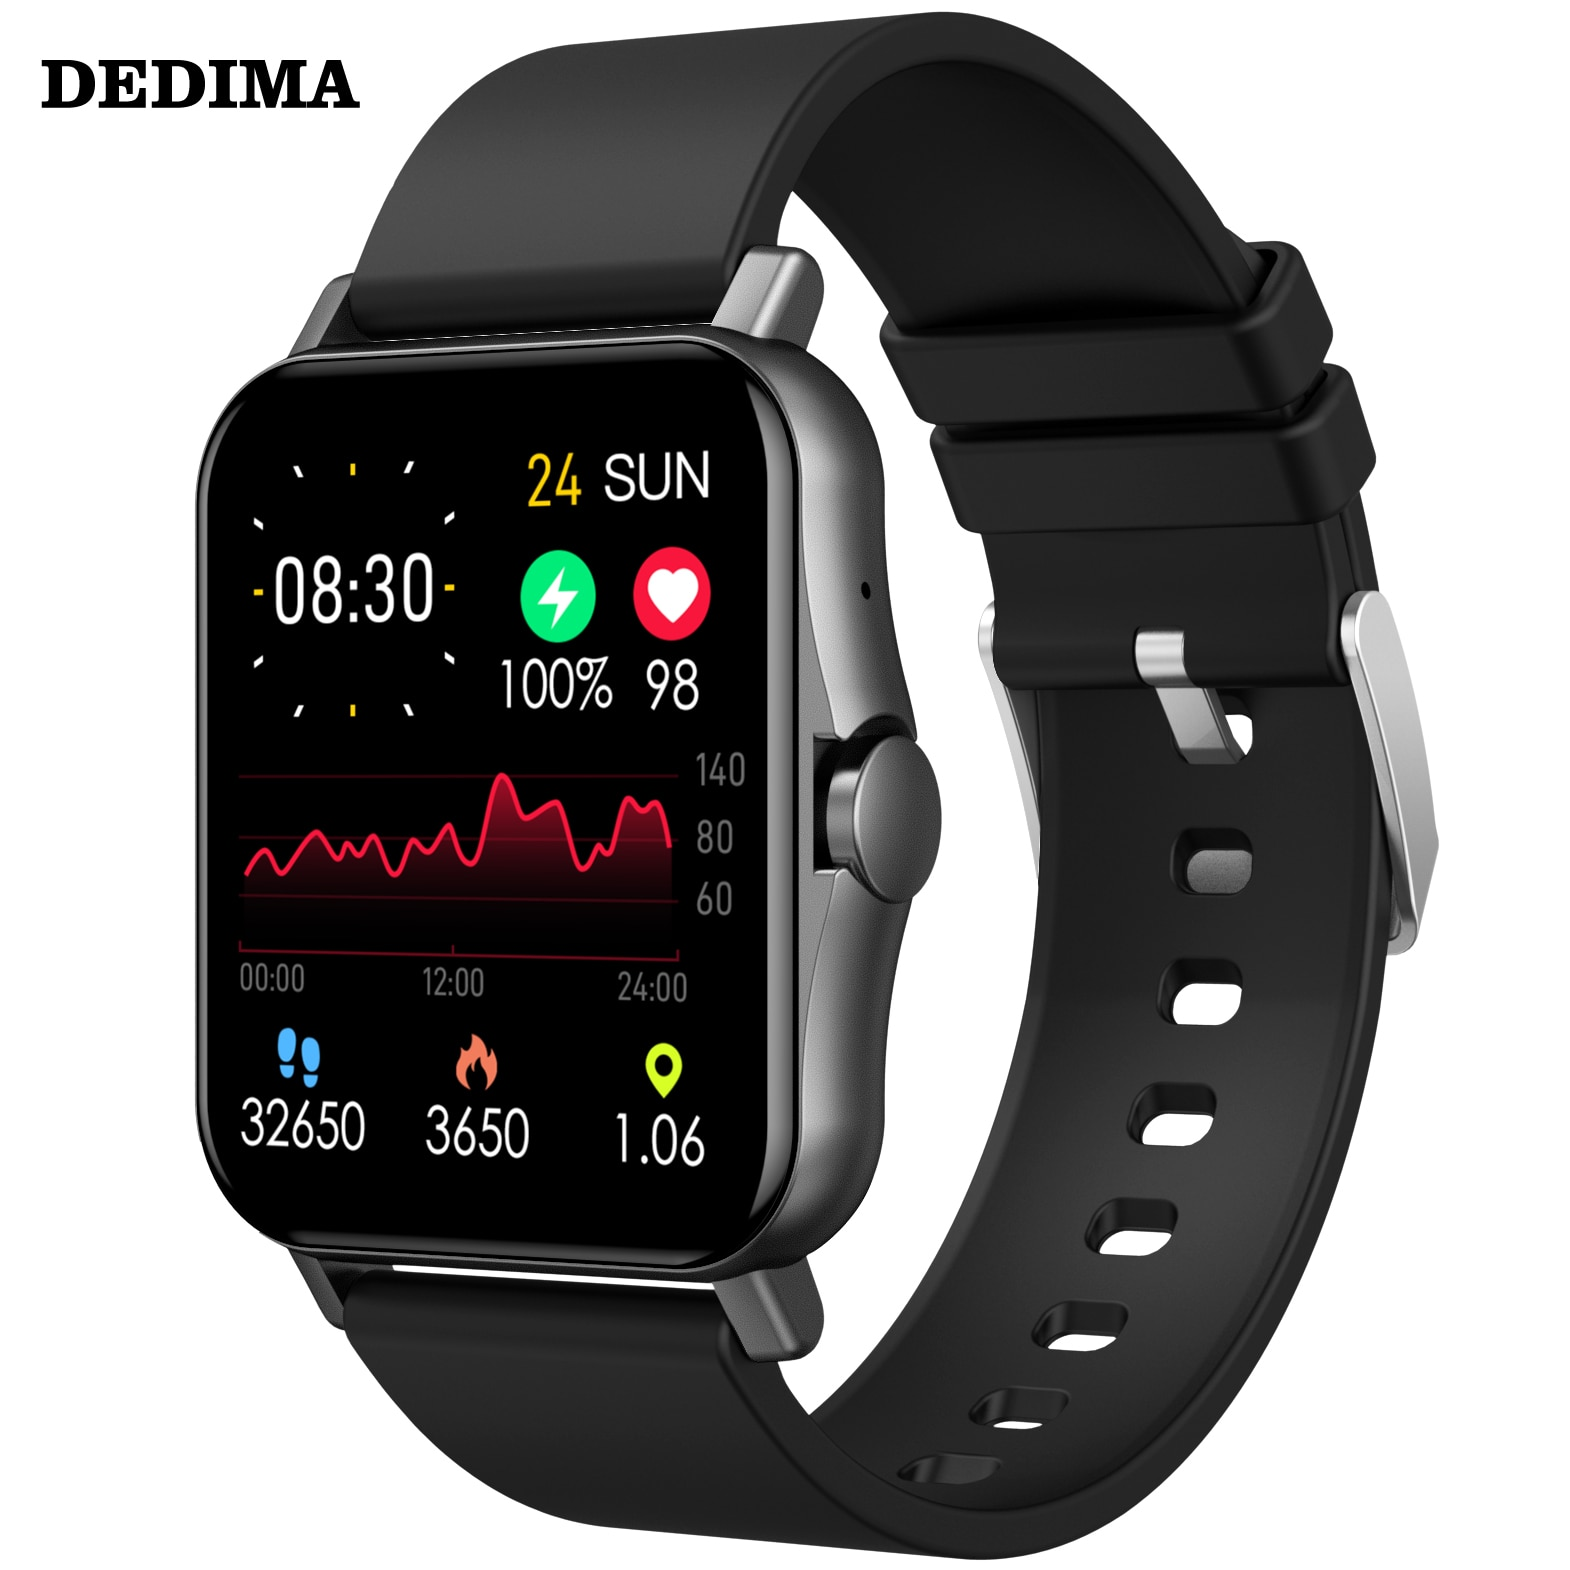 DEDIMA 1.4 بوصة ساعة ذكية الرجال كامل اللمس جهاز تعقب للياقة البدنية ضغط الدم ساعة ذكية النساء GTS Smartwatch ل أندرويد iOS